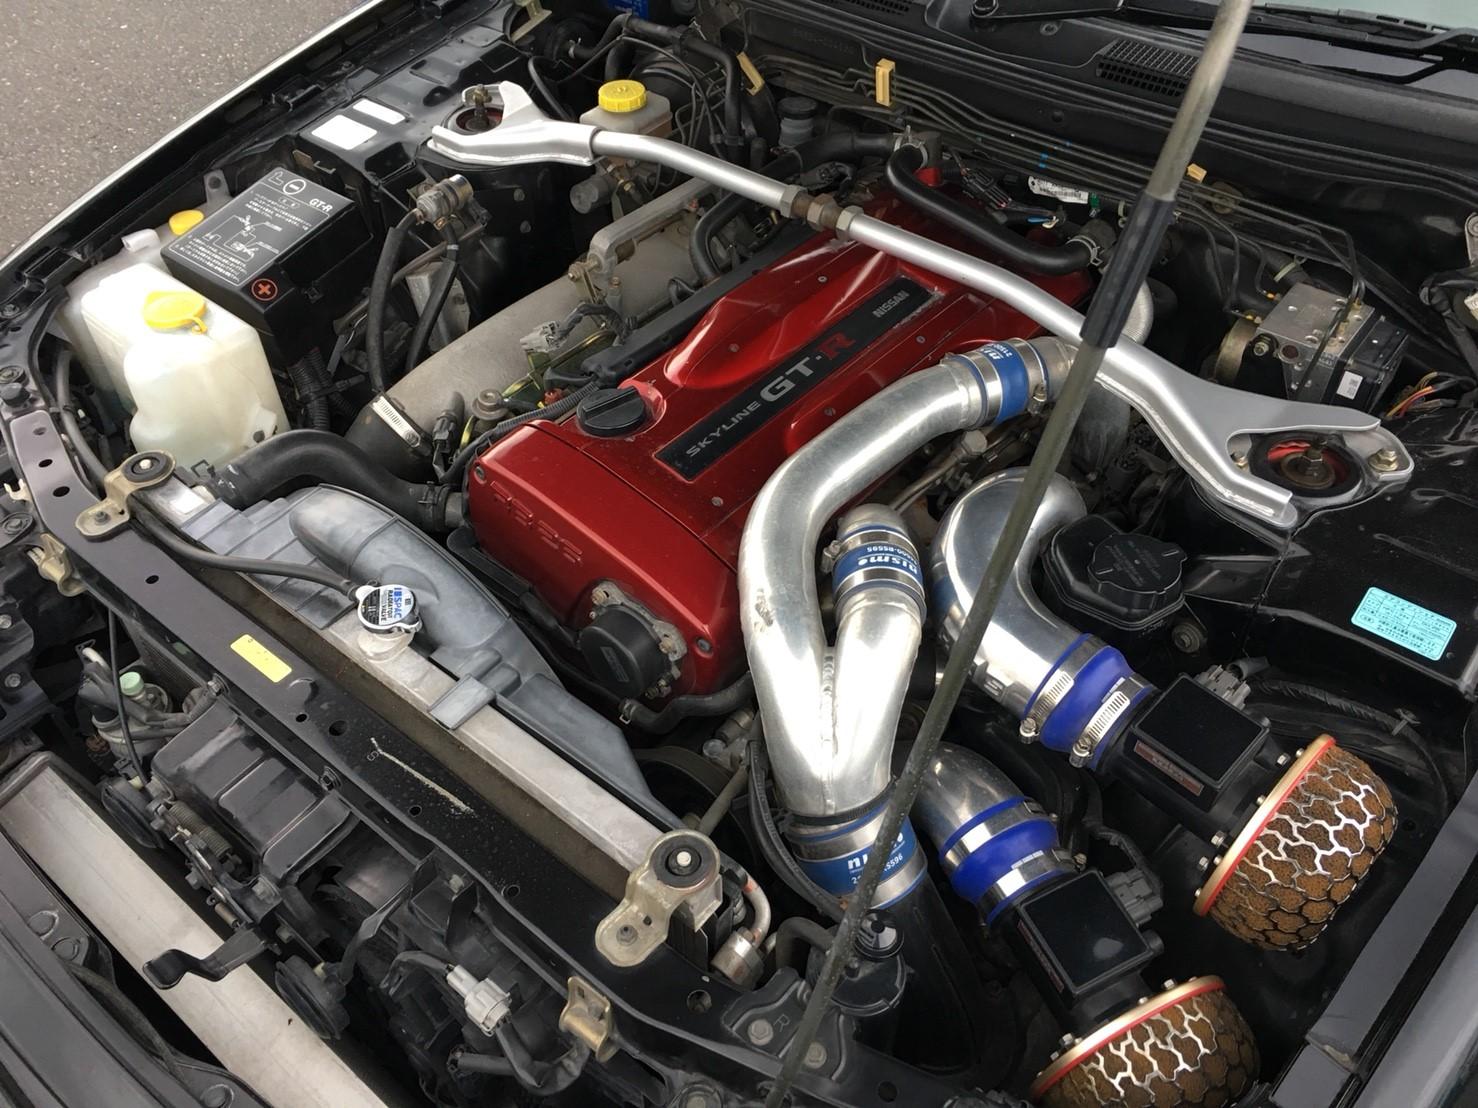 1999 Nissan Skyline R34 GT-R VSpec black engine 2